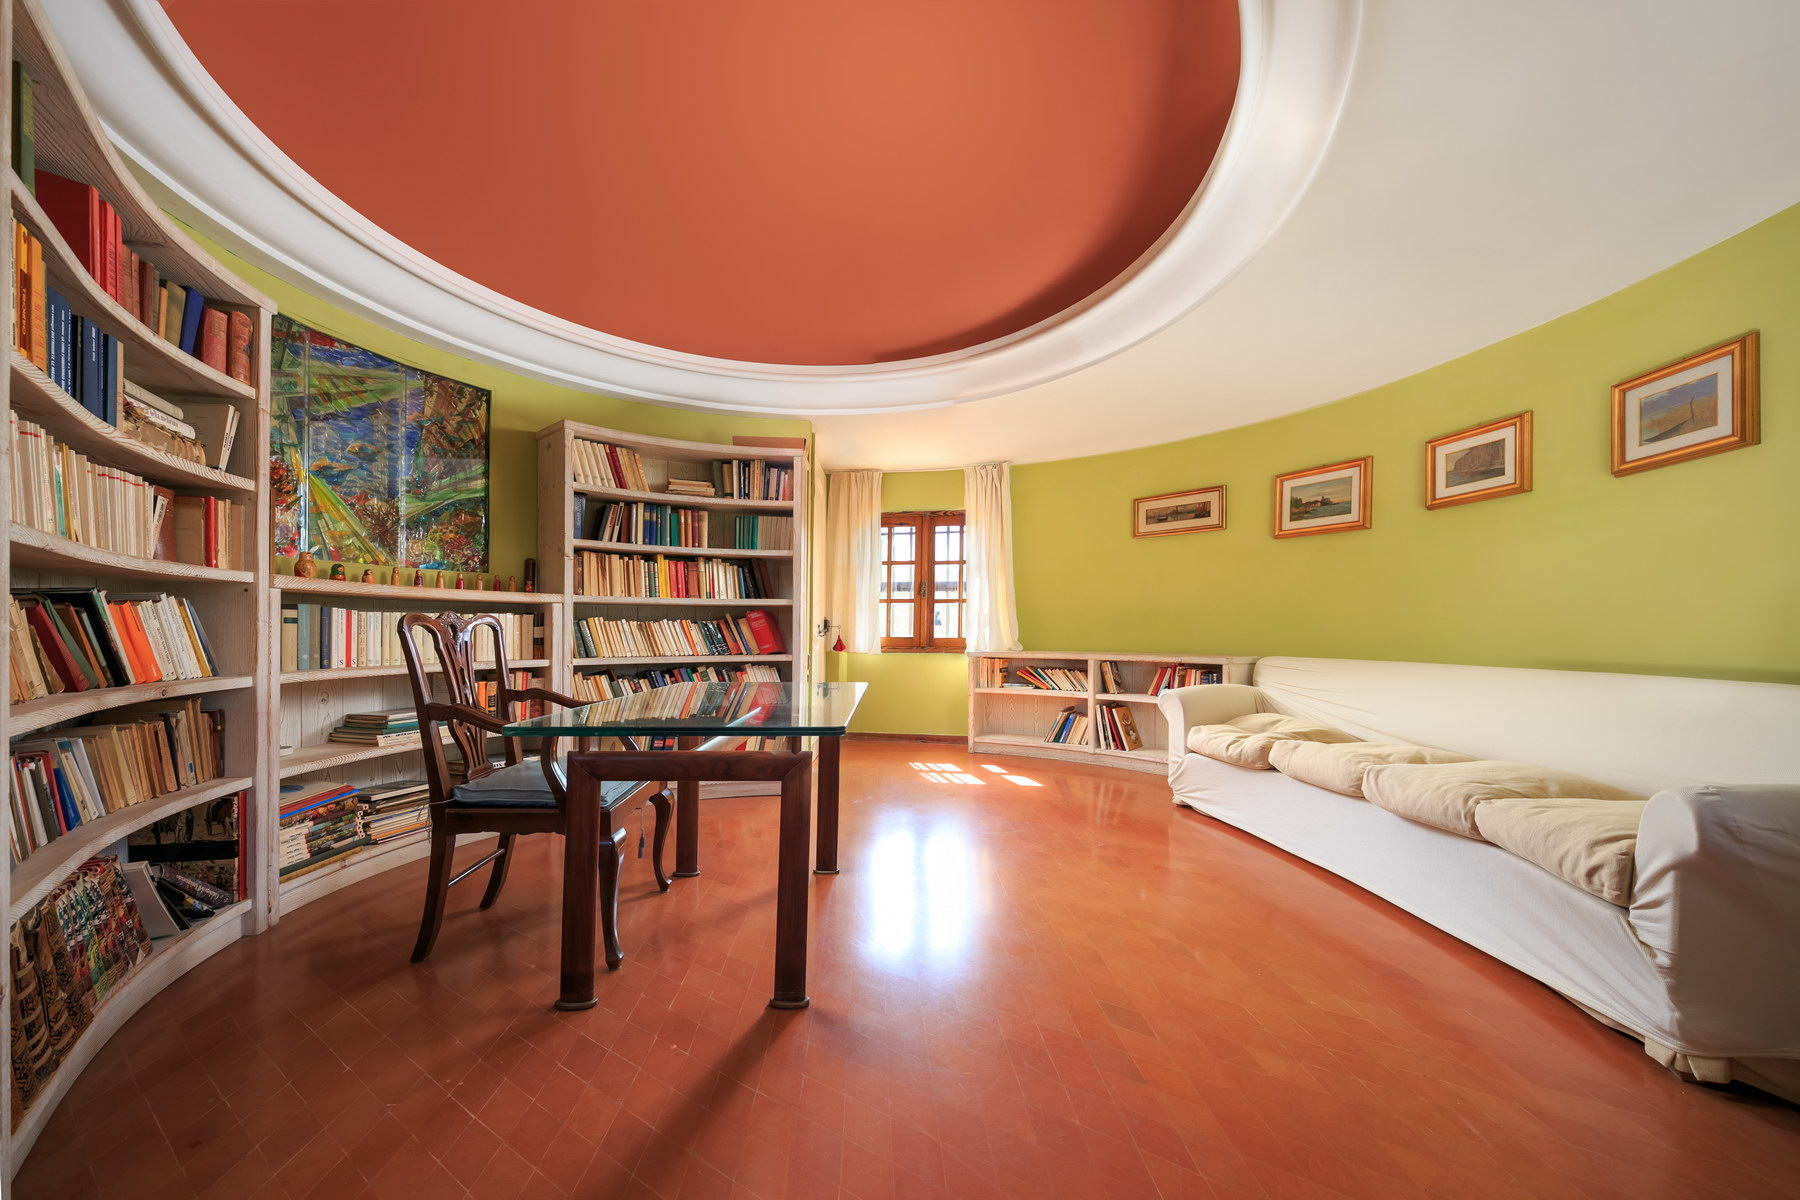 Villa in Vendita a Lerici: 5 locali, 620 mq - Foto 20